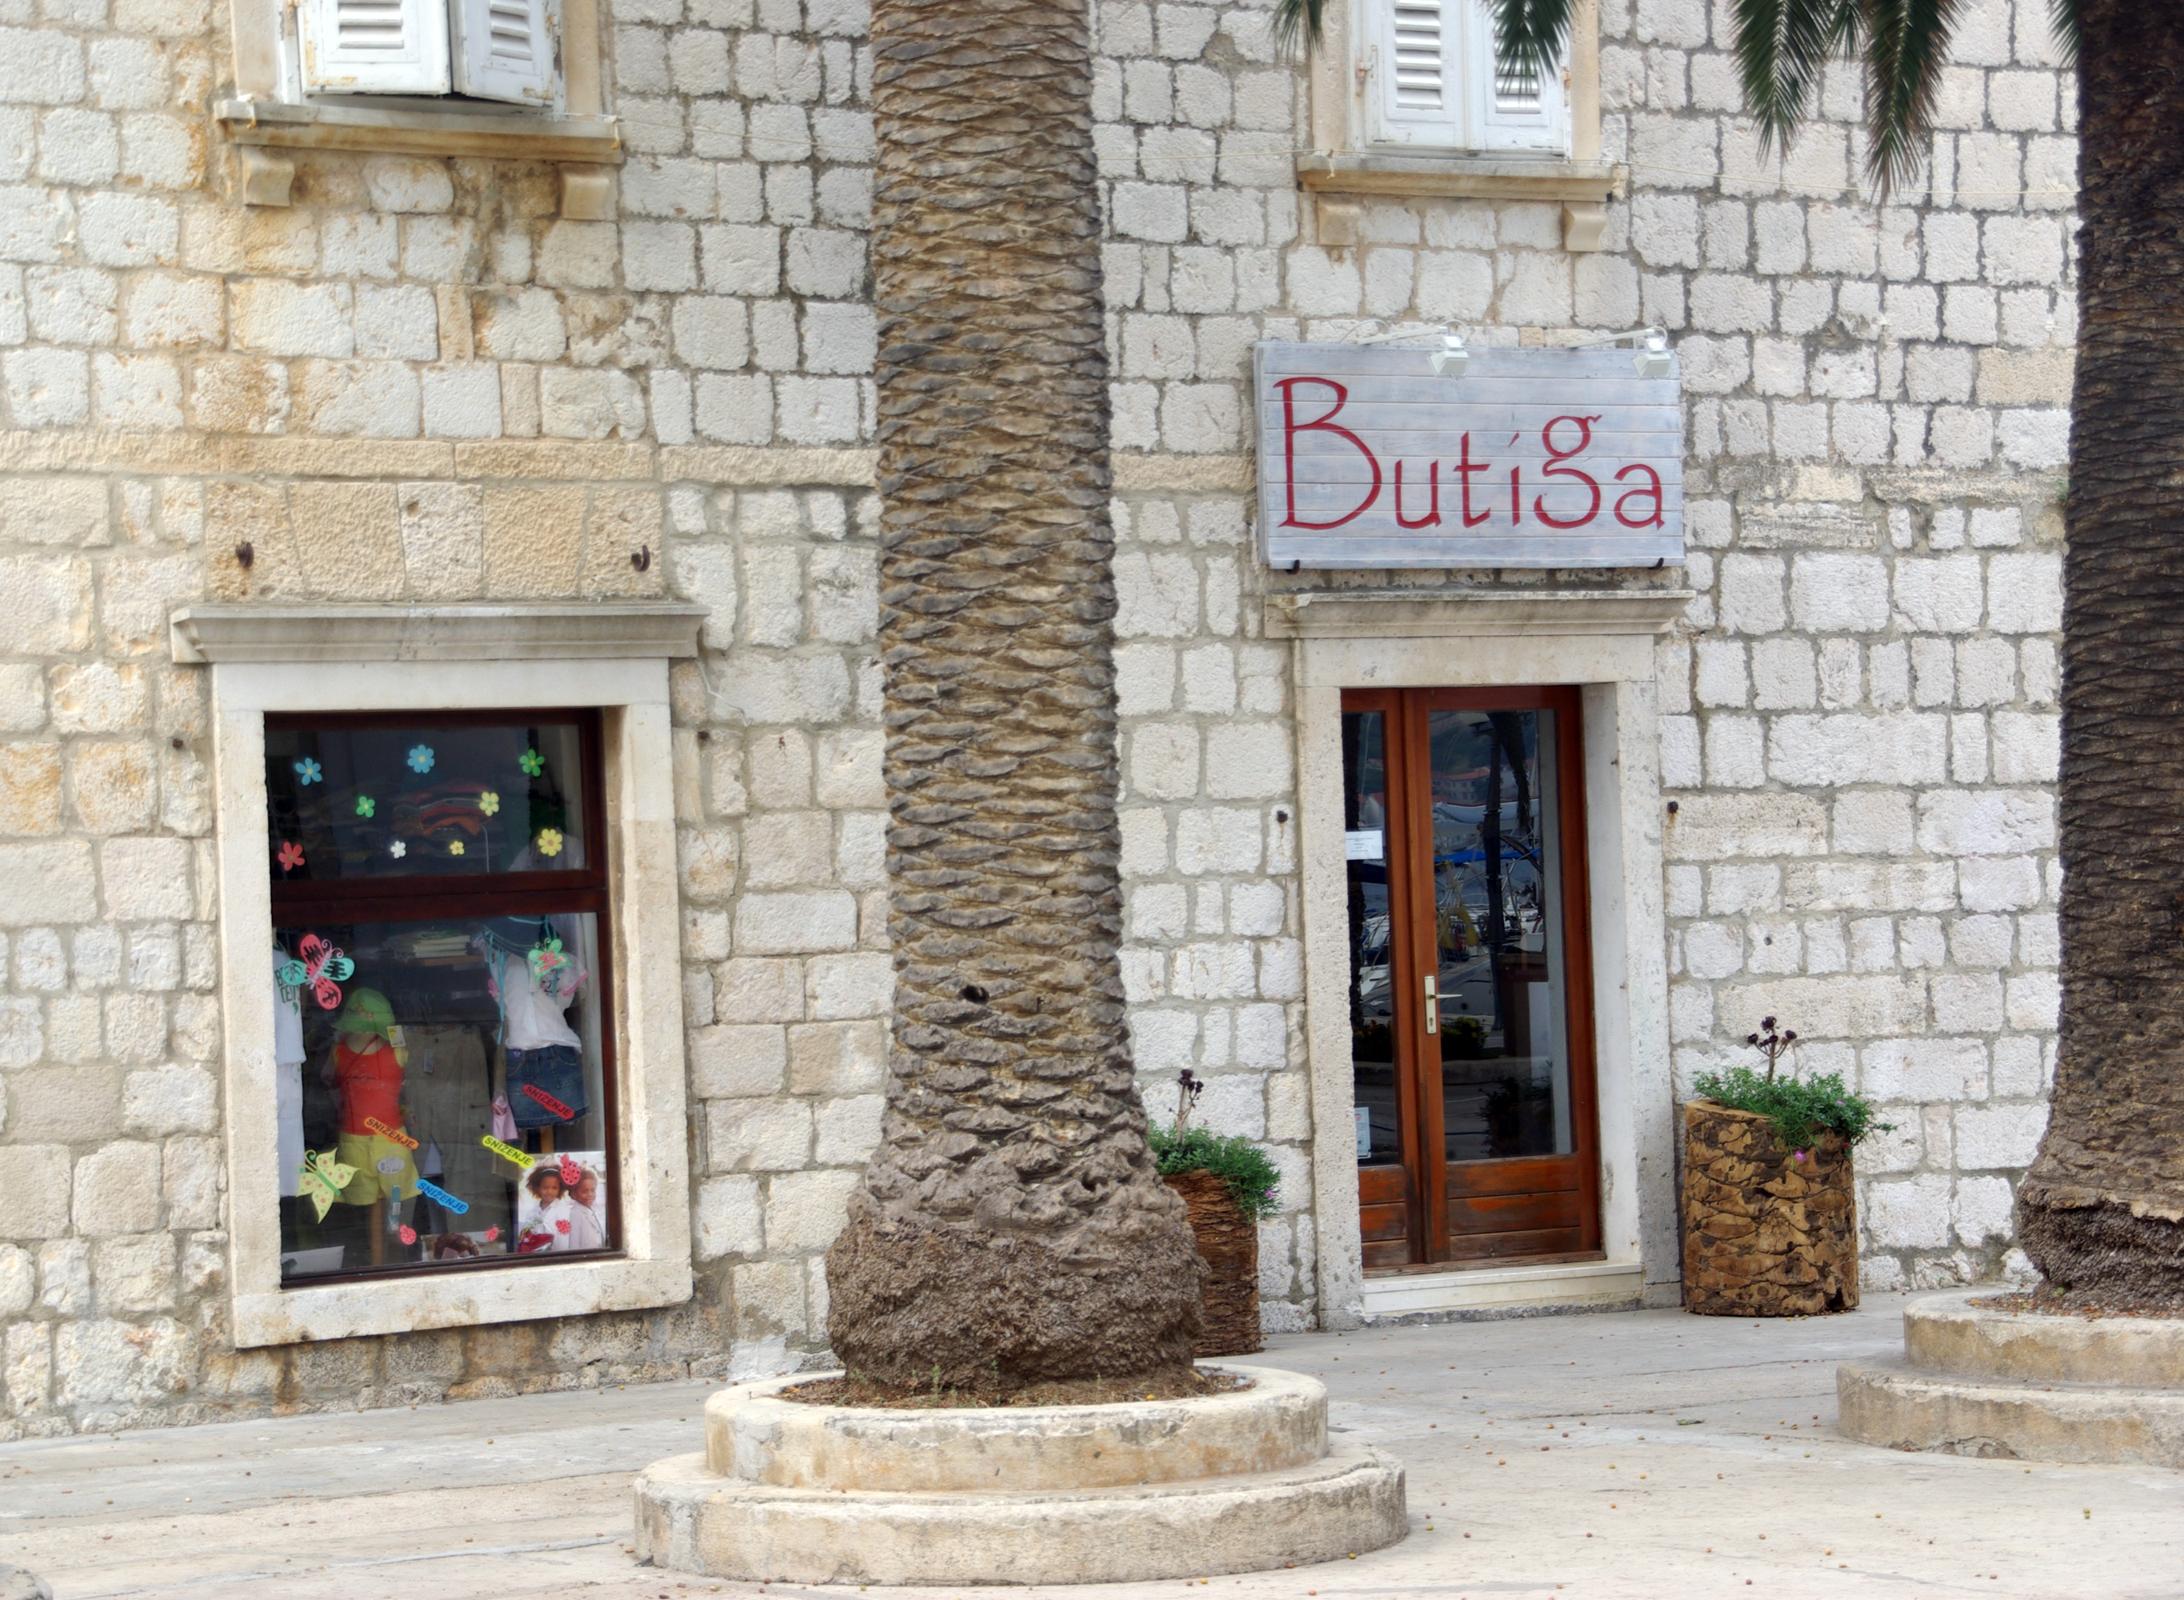 Butiga. Foto: Sebastià Giralt (http://www.flickr.com/photos/sebastiagiralt/)